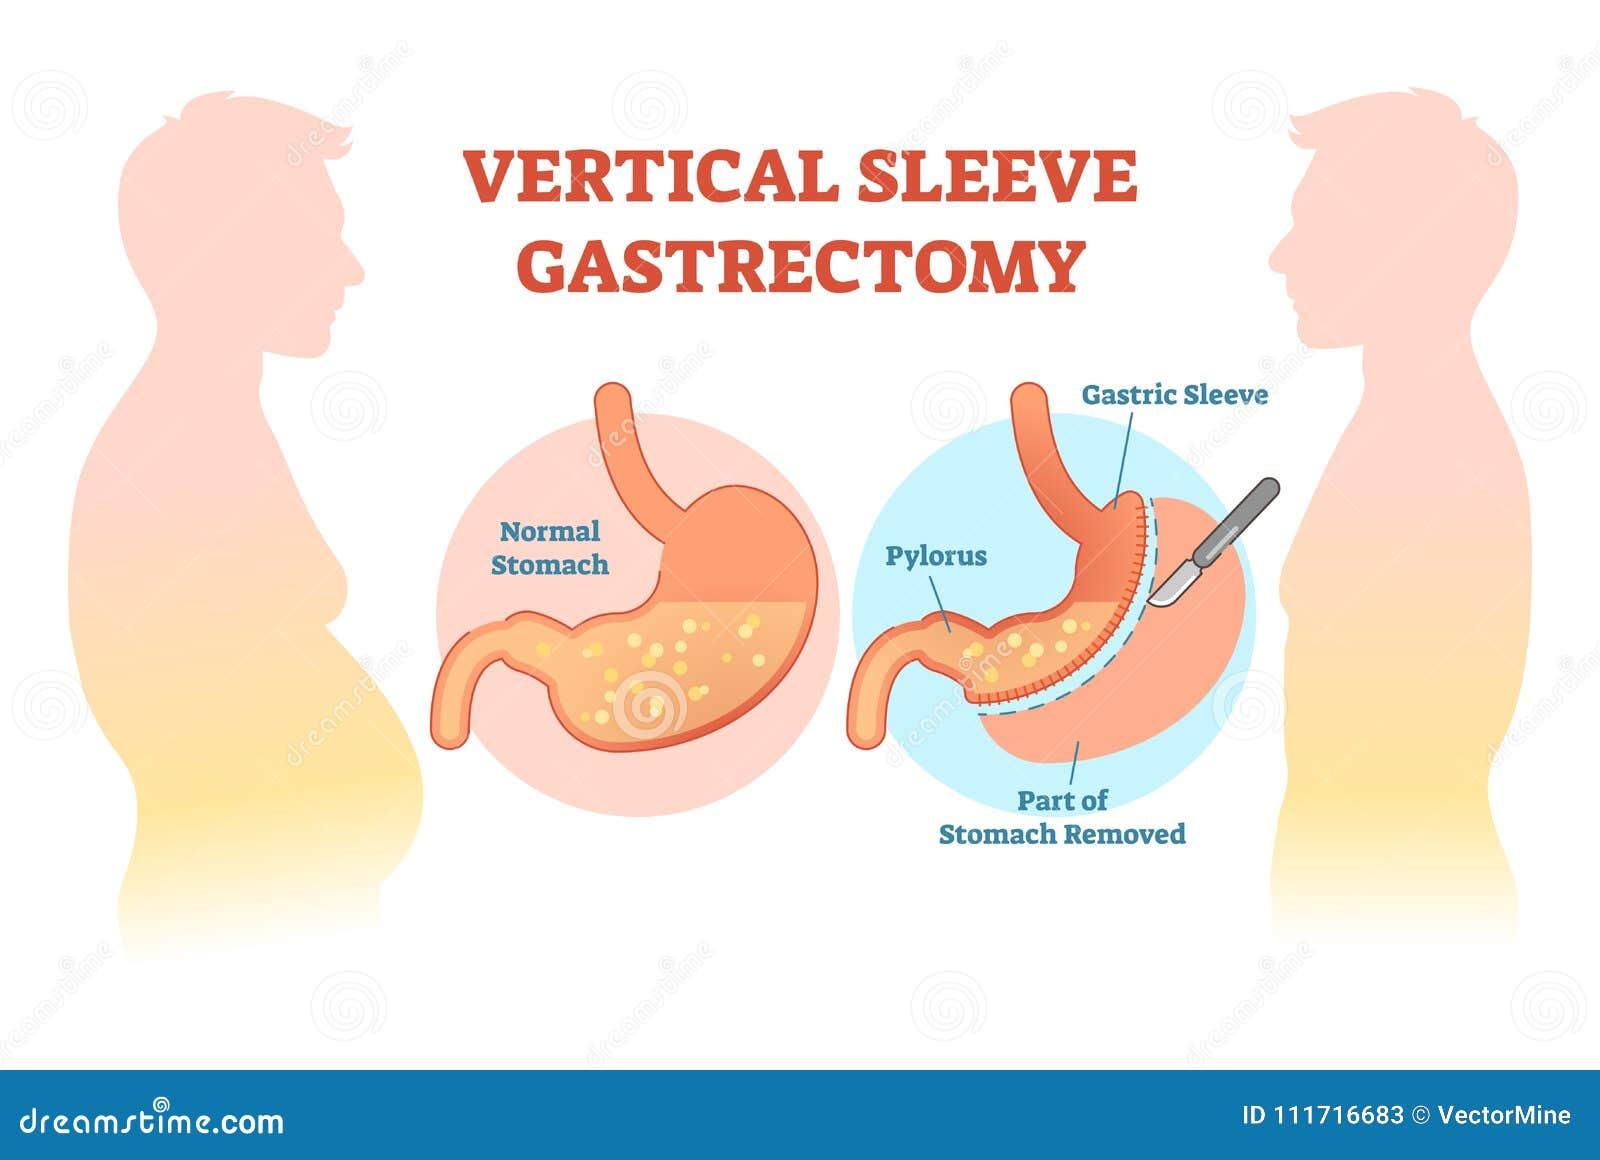 Gastric Sleeve Anatomy Choice Image - human body anatomy